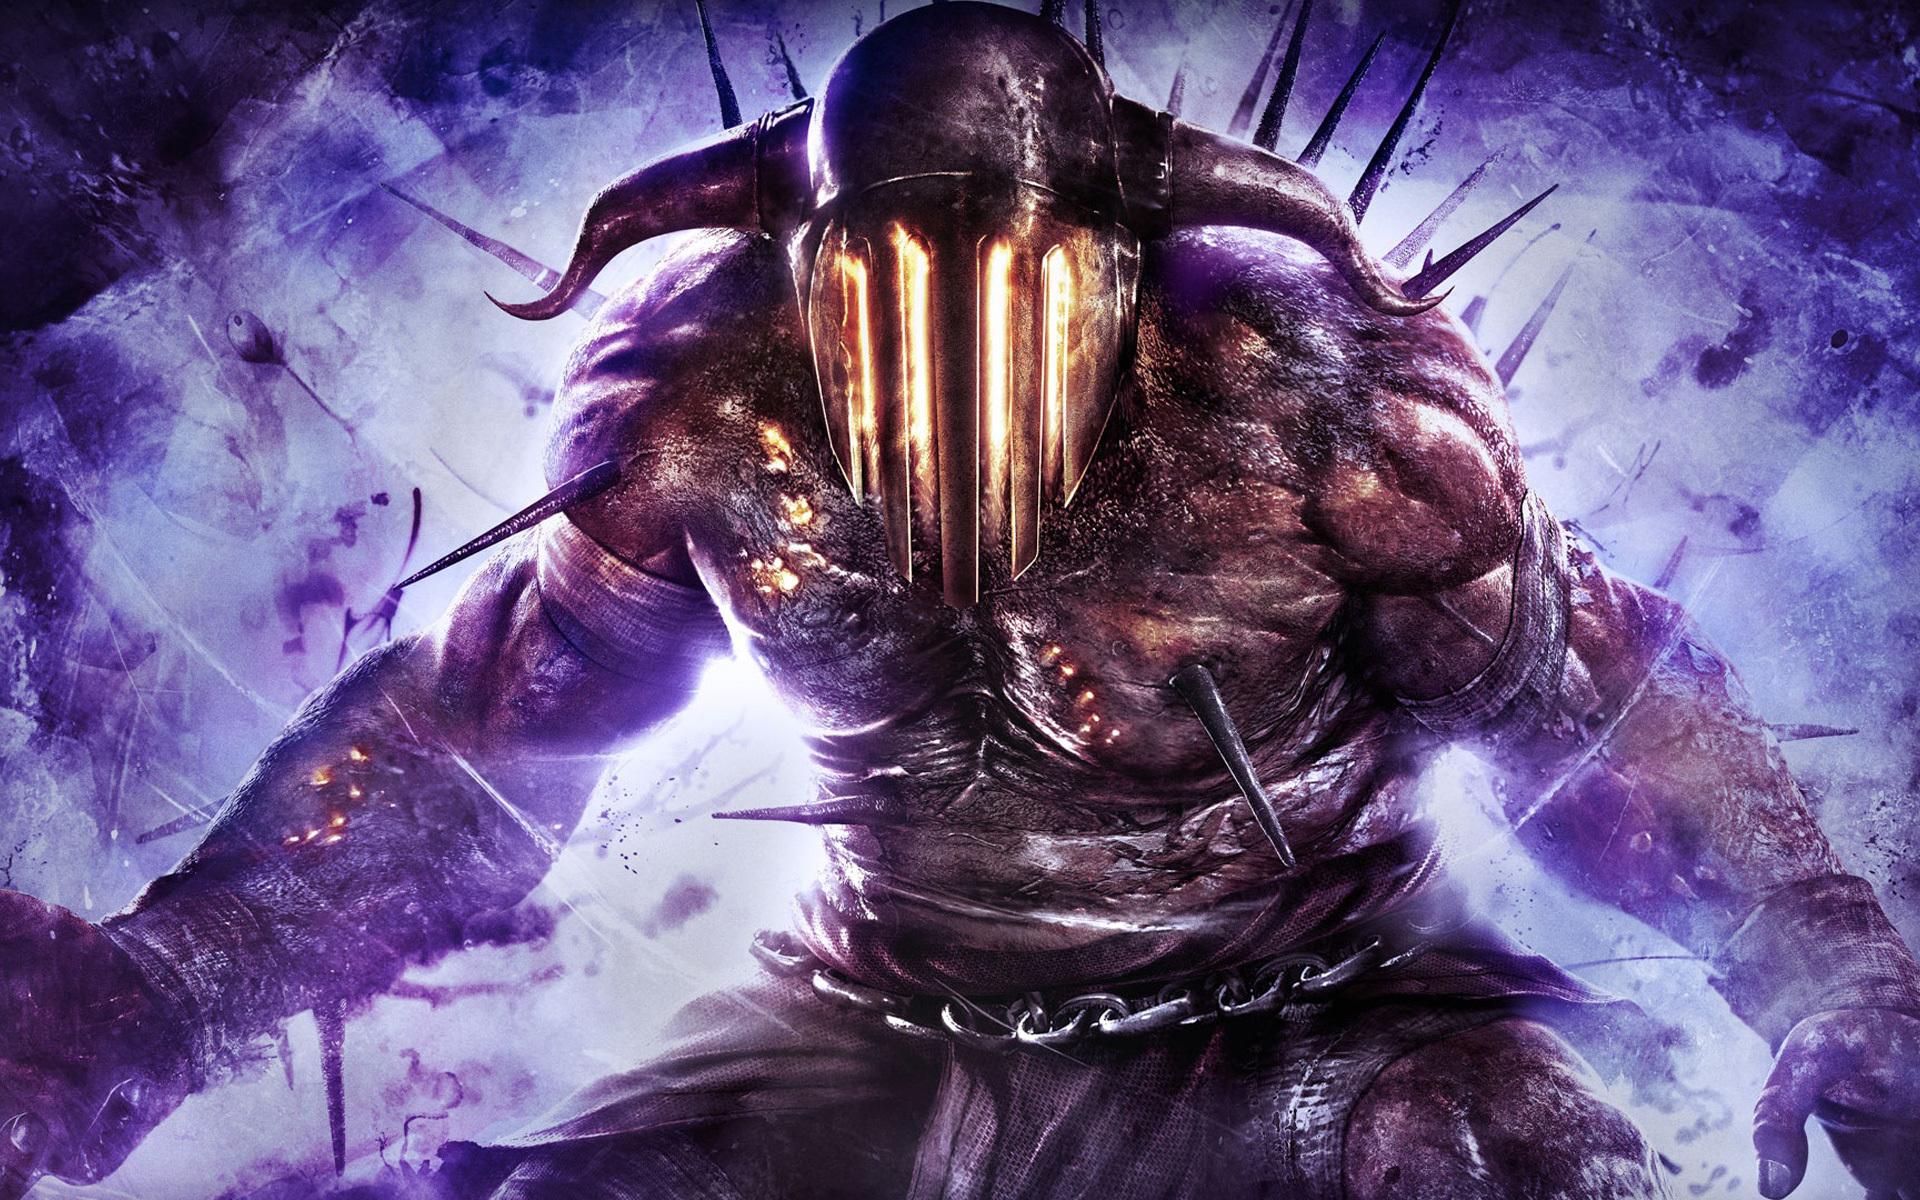 2048x1152 god of war ascension hades 2048x1152 Resolution 1920x1200